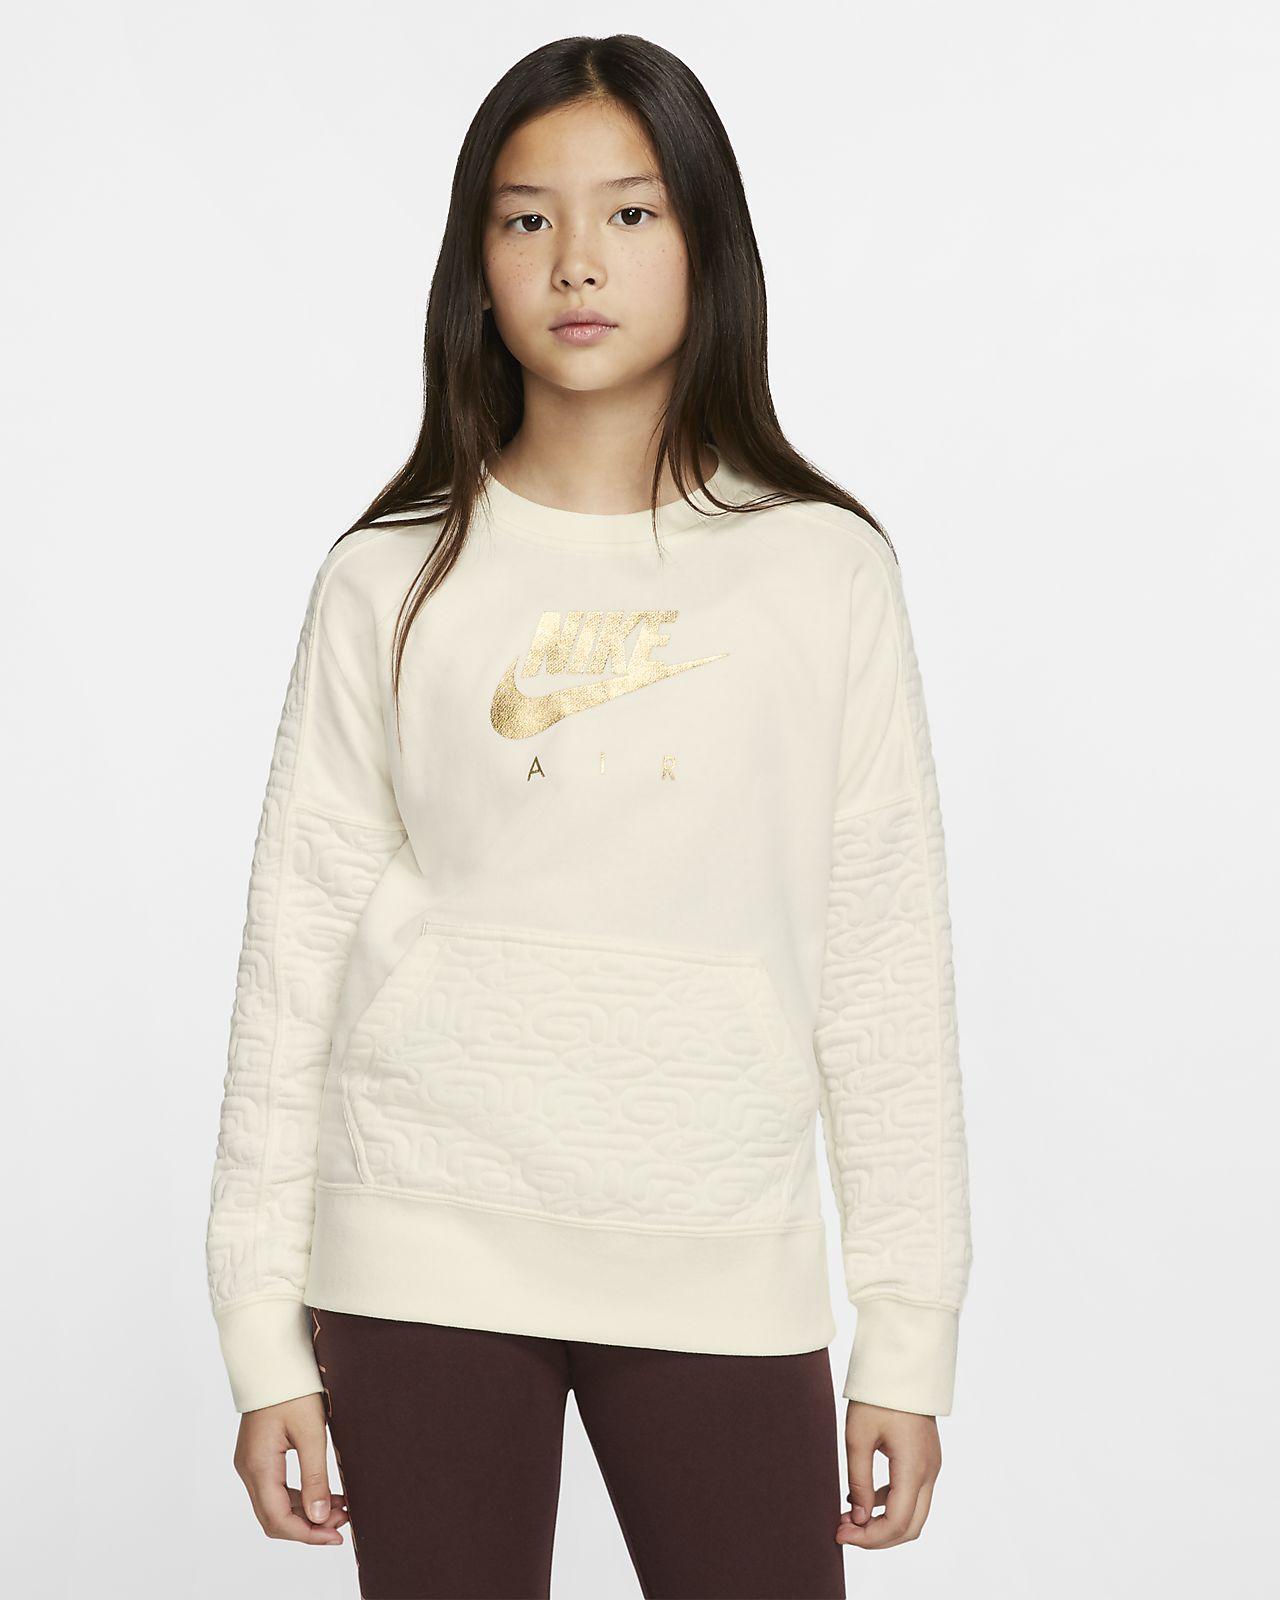 Prenda para la parte superior de tejido Fleece de manga larga para niña Nike Air